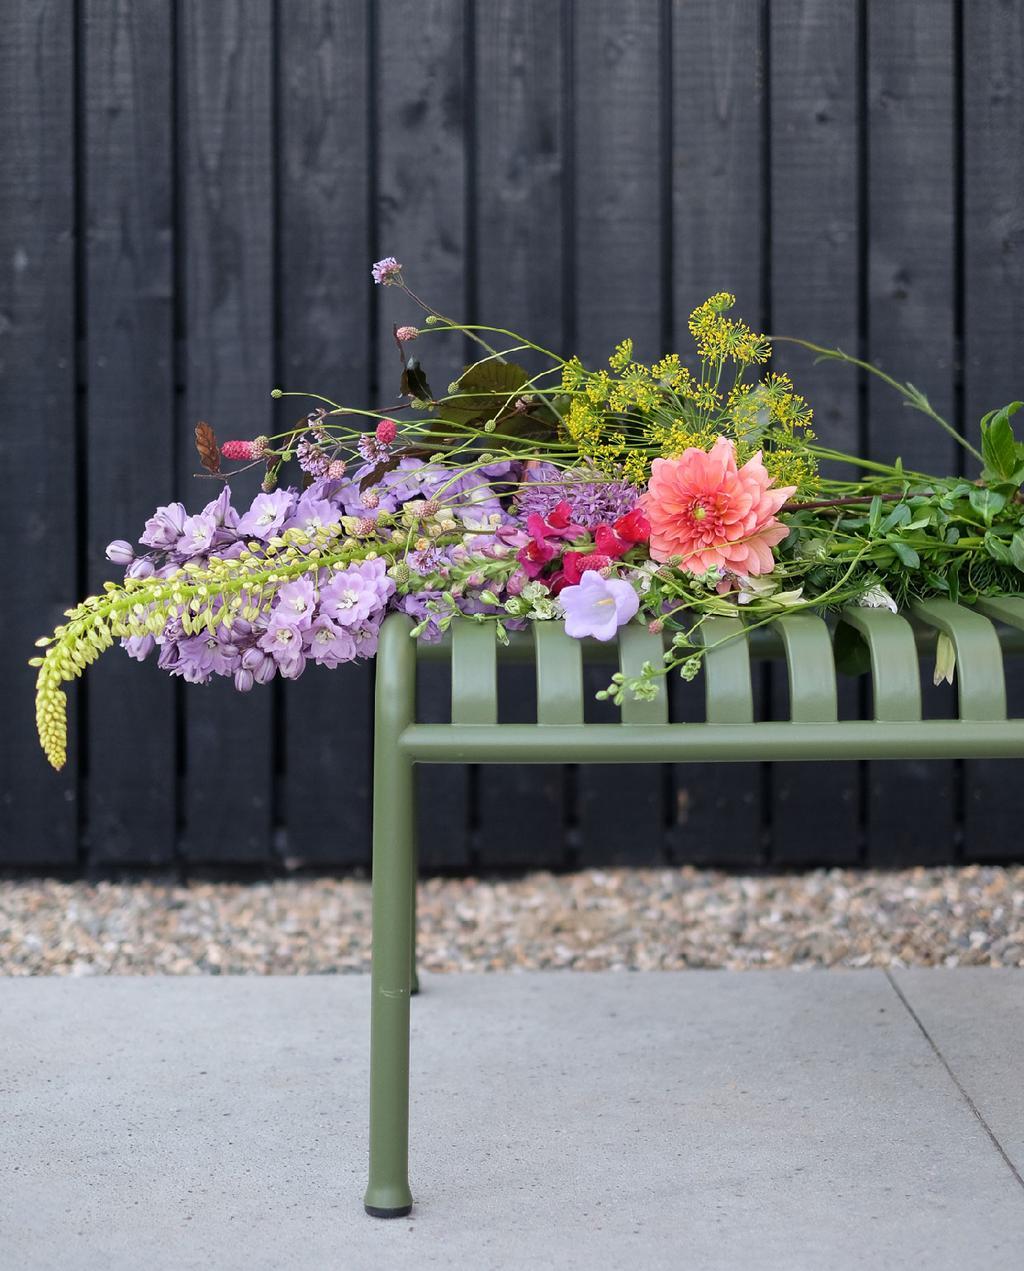 blog prchtg vtwonen | design tuinmeubelen groene metalen tuinbank